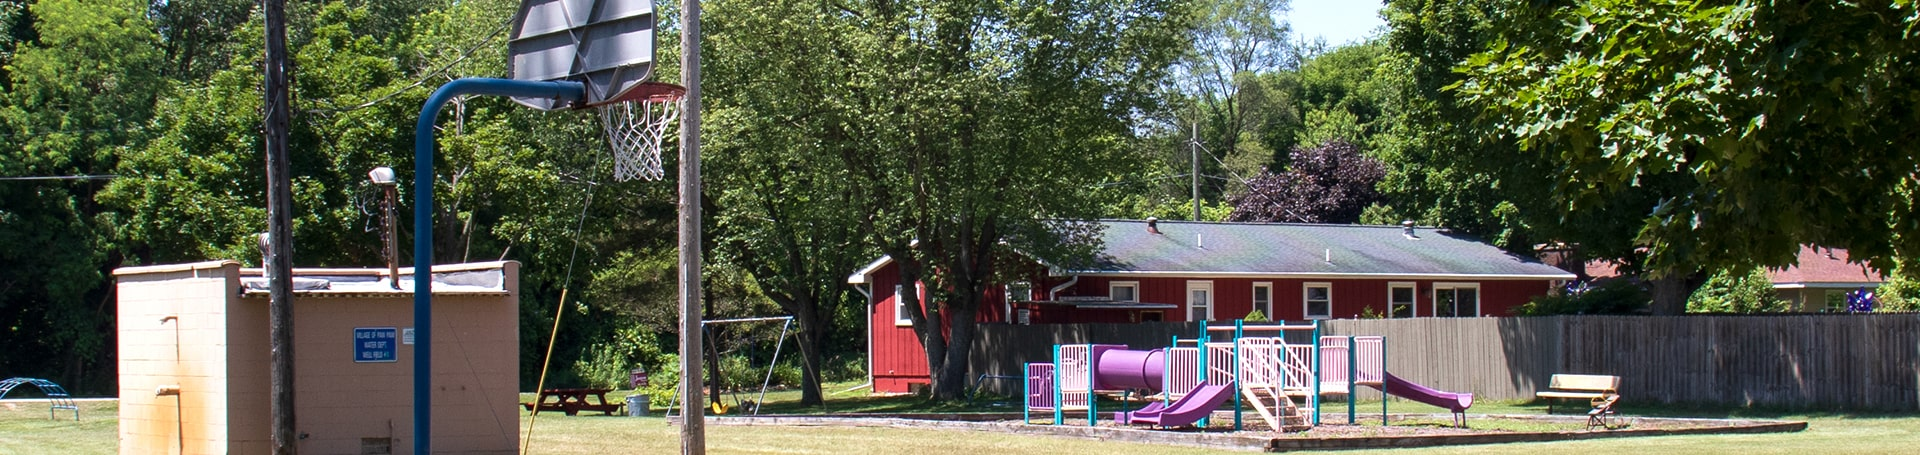 Village of Paw Paw banner area slide image -